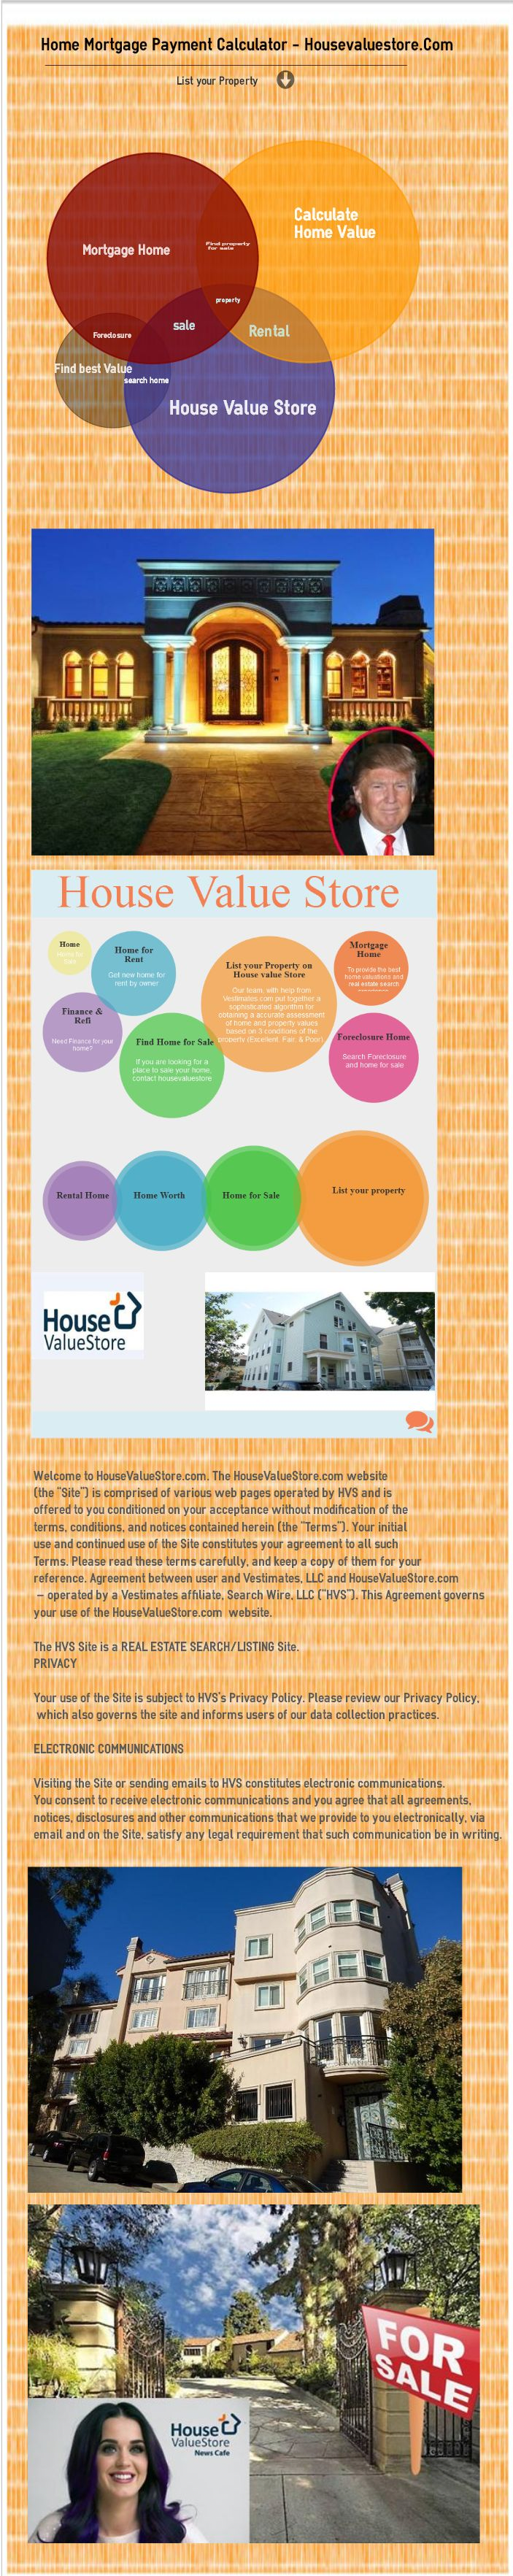 9 best HVS Infograph images on Pinterest